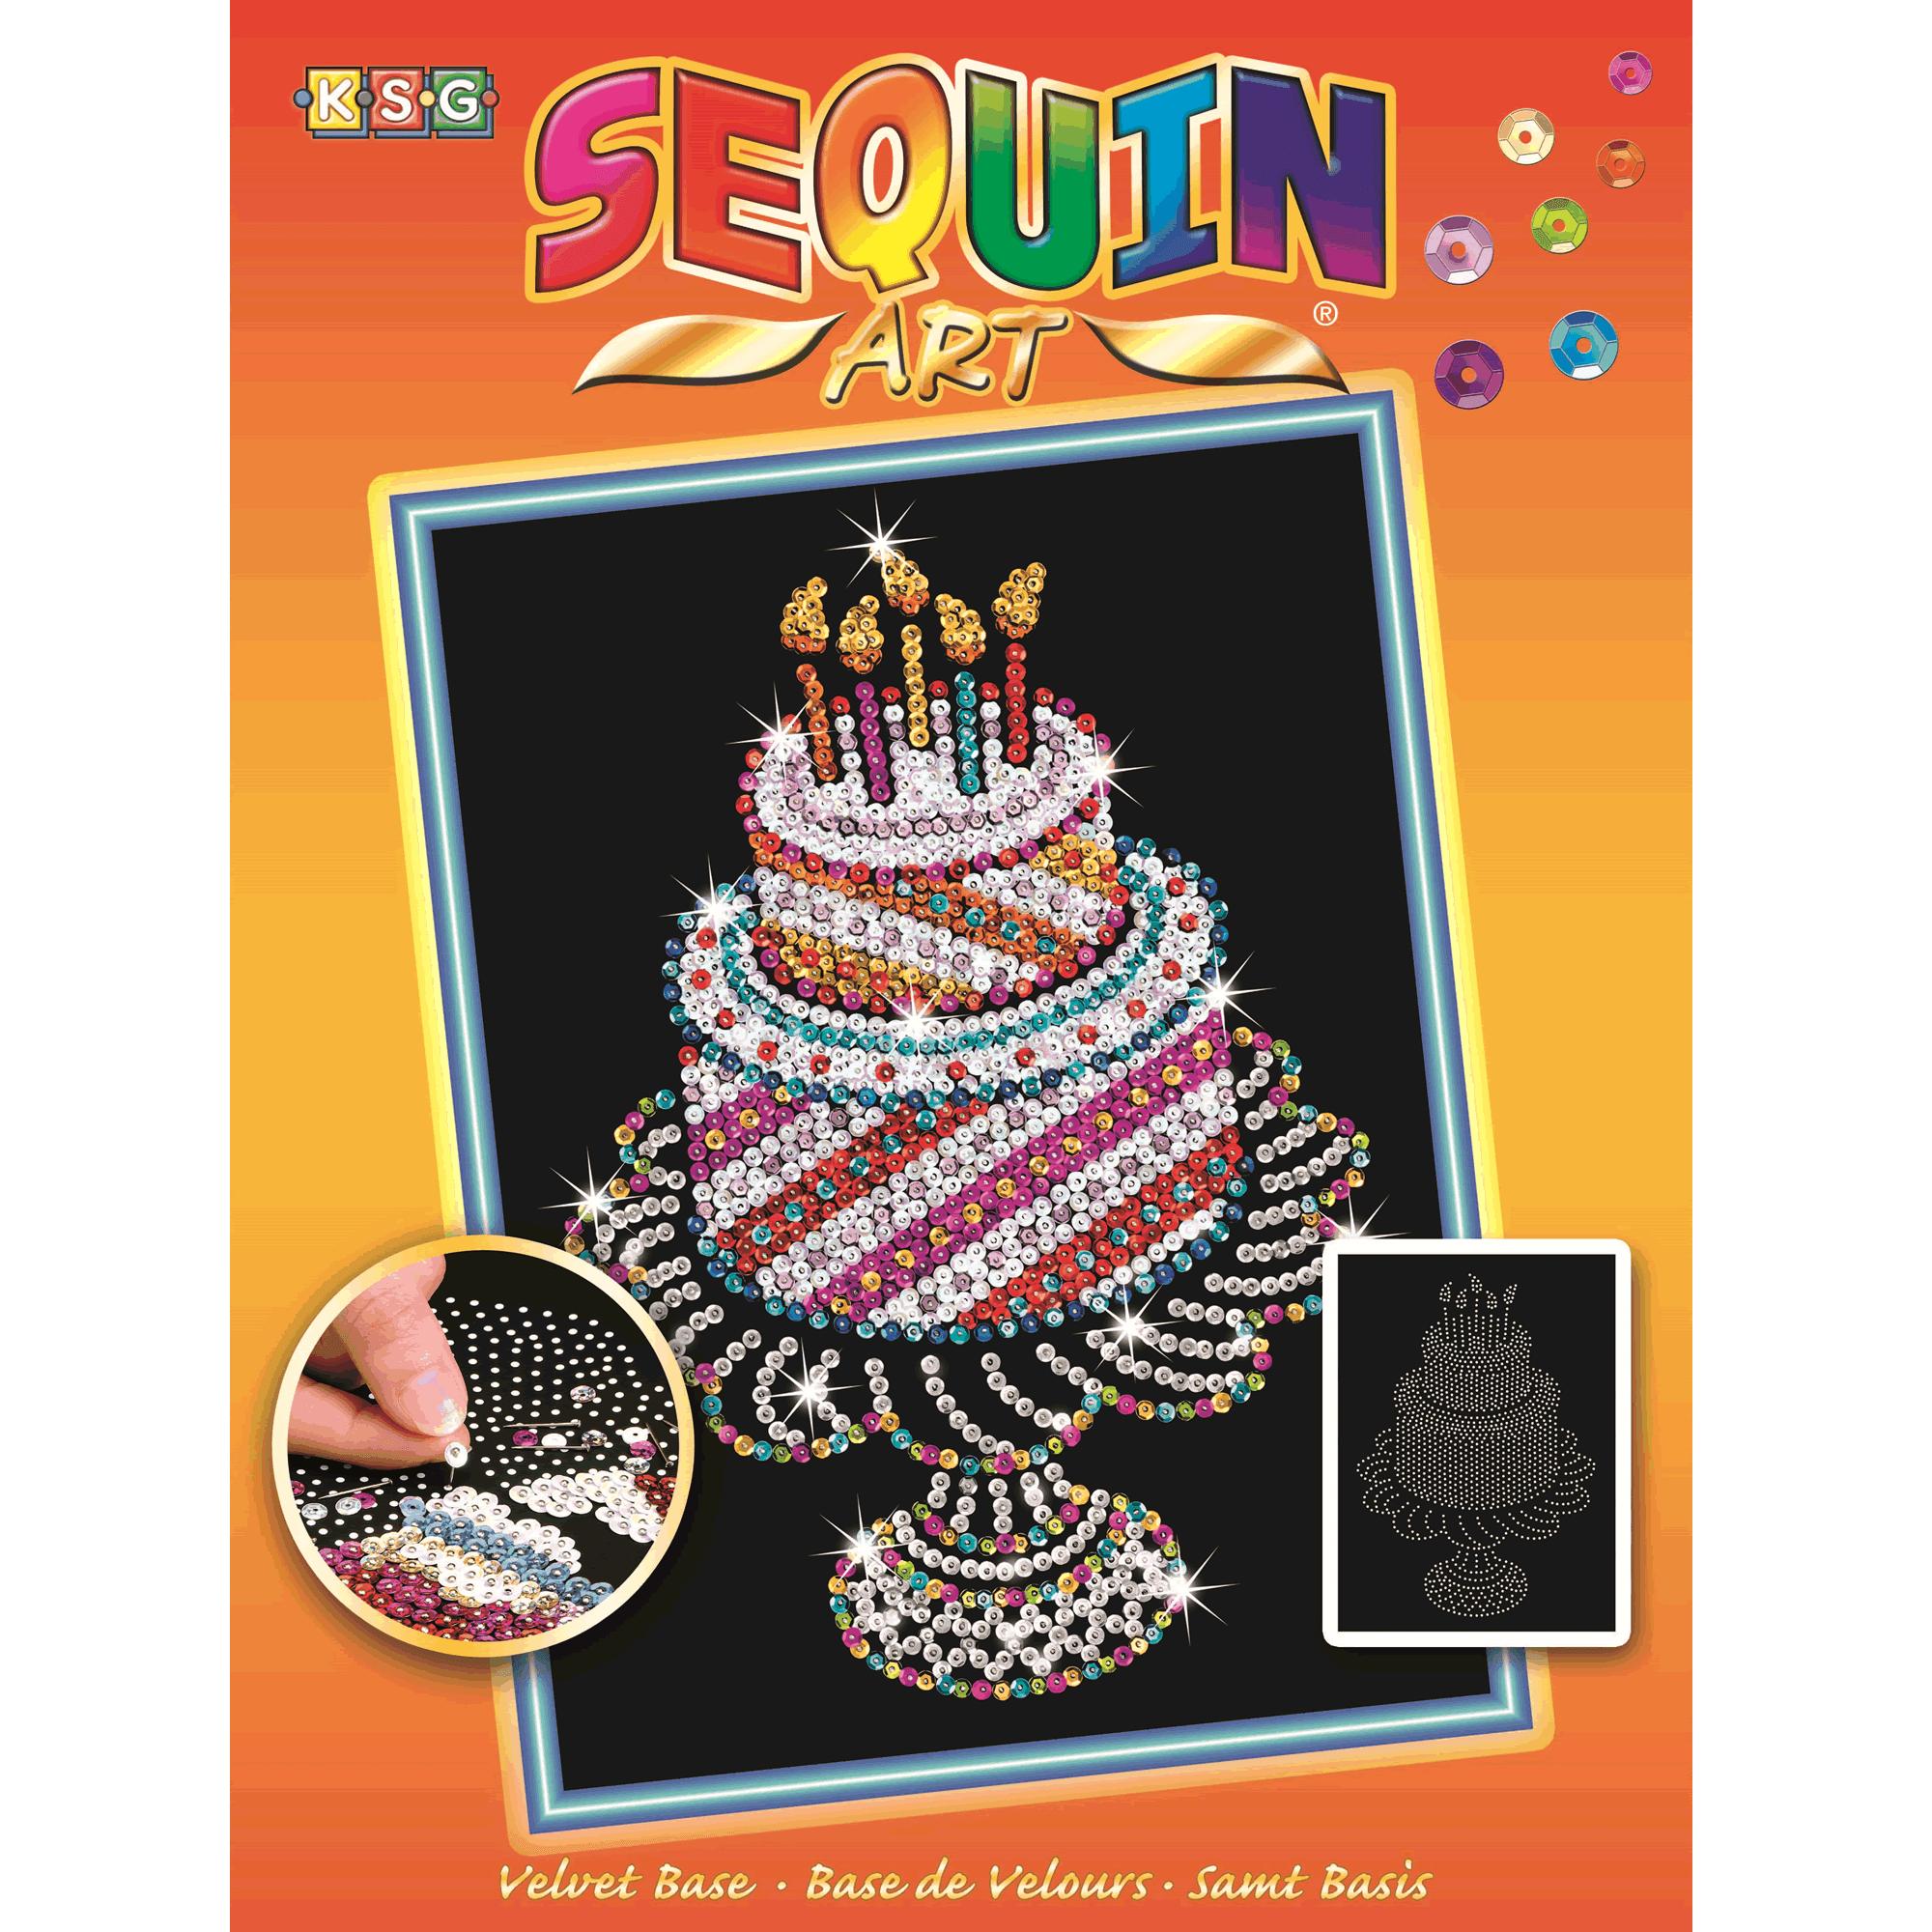 Fantastic Birthday Cake Sequin Art Craftyarts Co Uk Funny Birthday Cards Online Alyptdamsfinfo